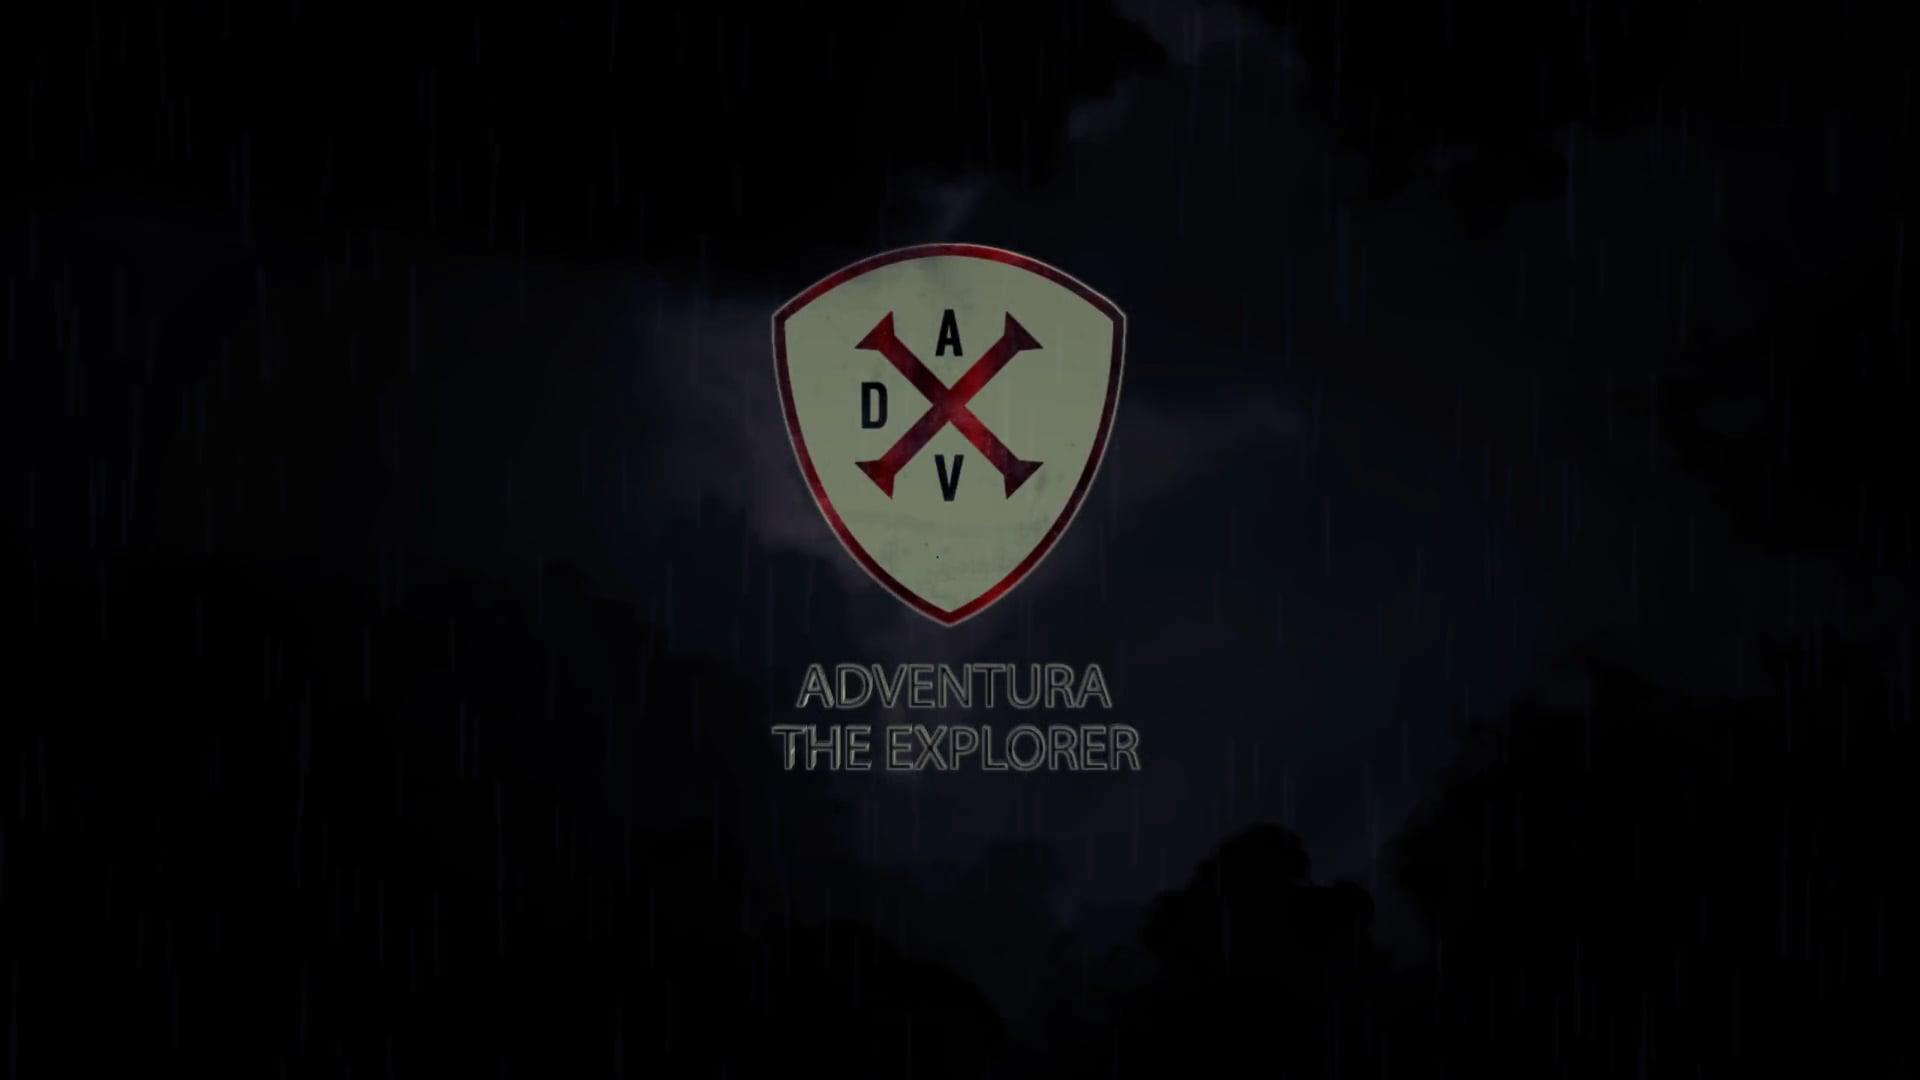 ADVentura – The Explorer, discover the amazing taste!